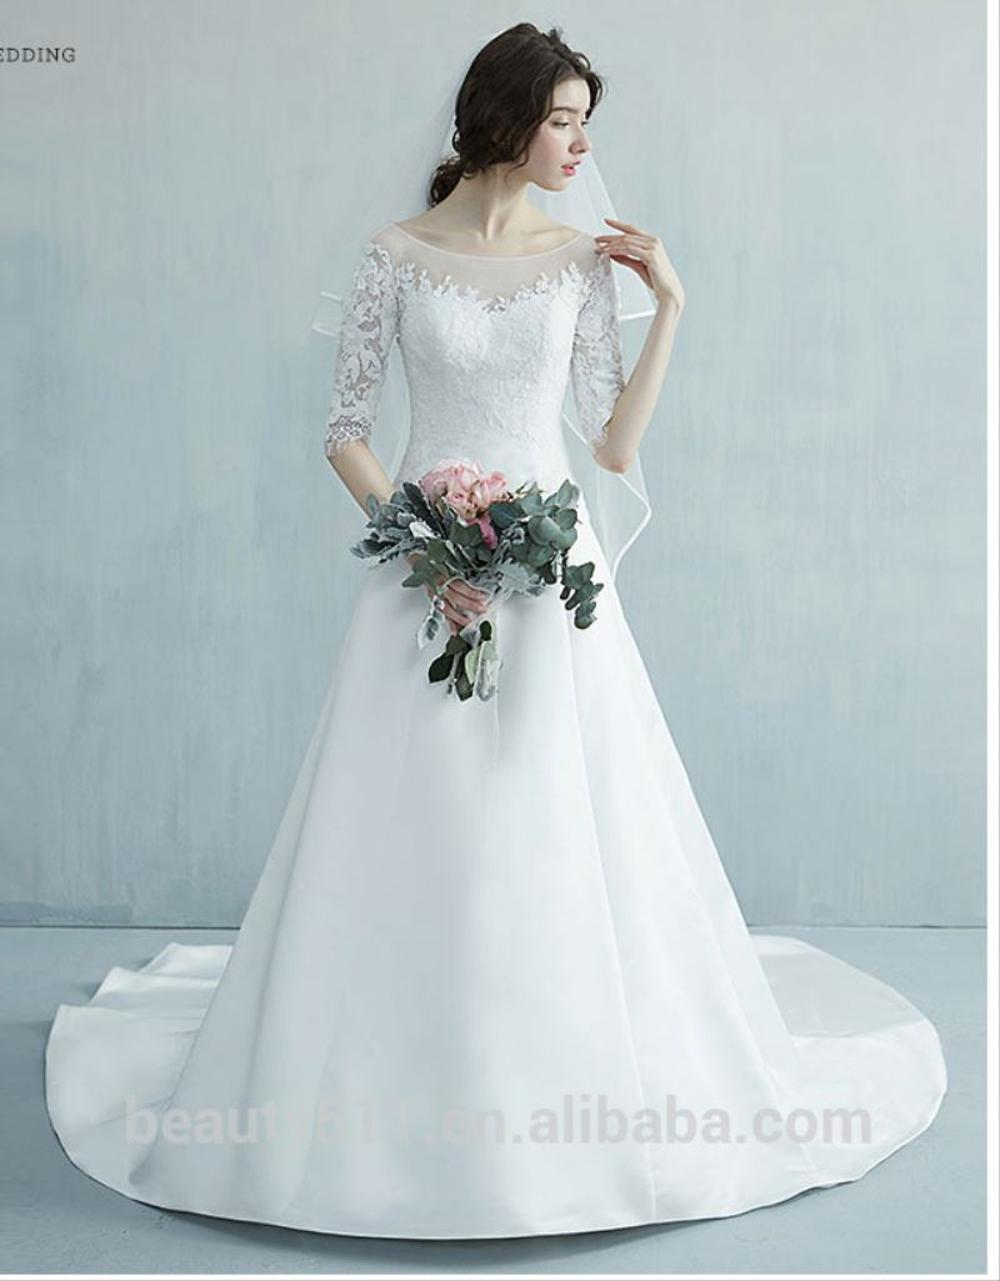 Bridal Wedding Dress Prom Dress Gown, Bridal Wedding Dress Prom ...